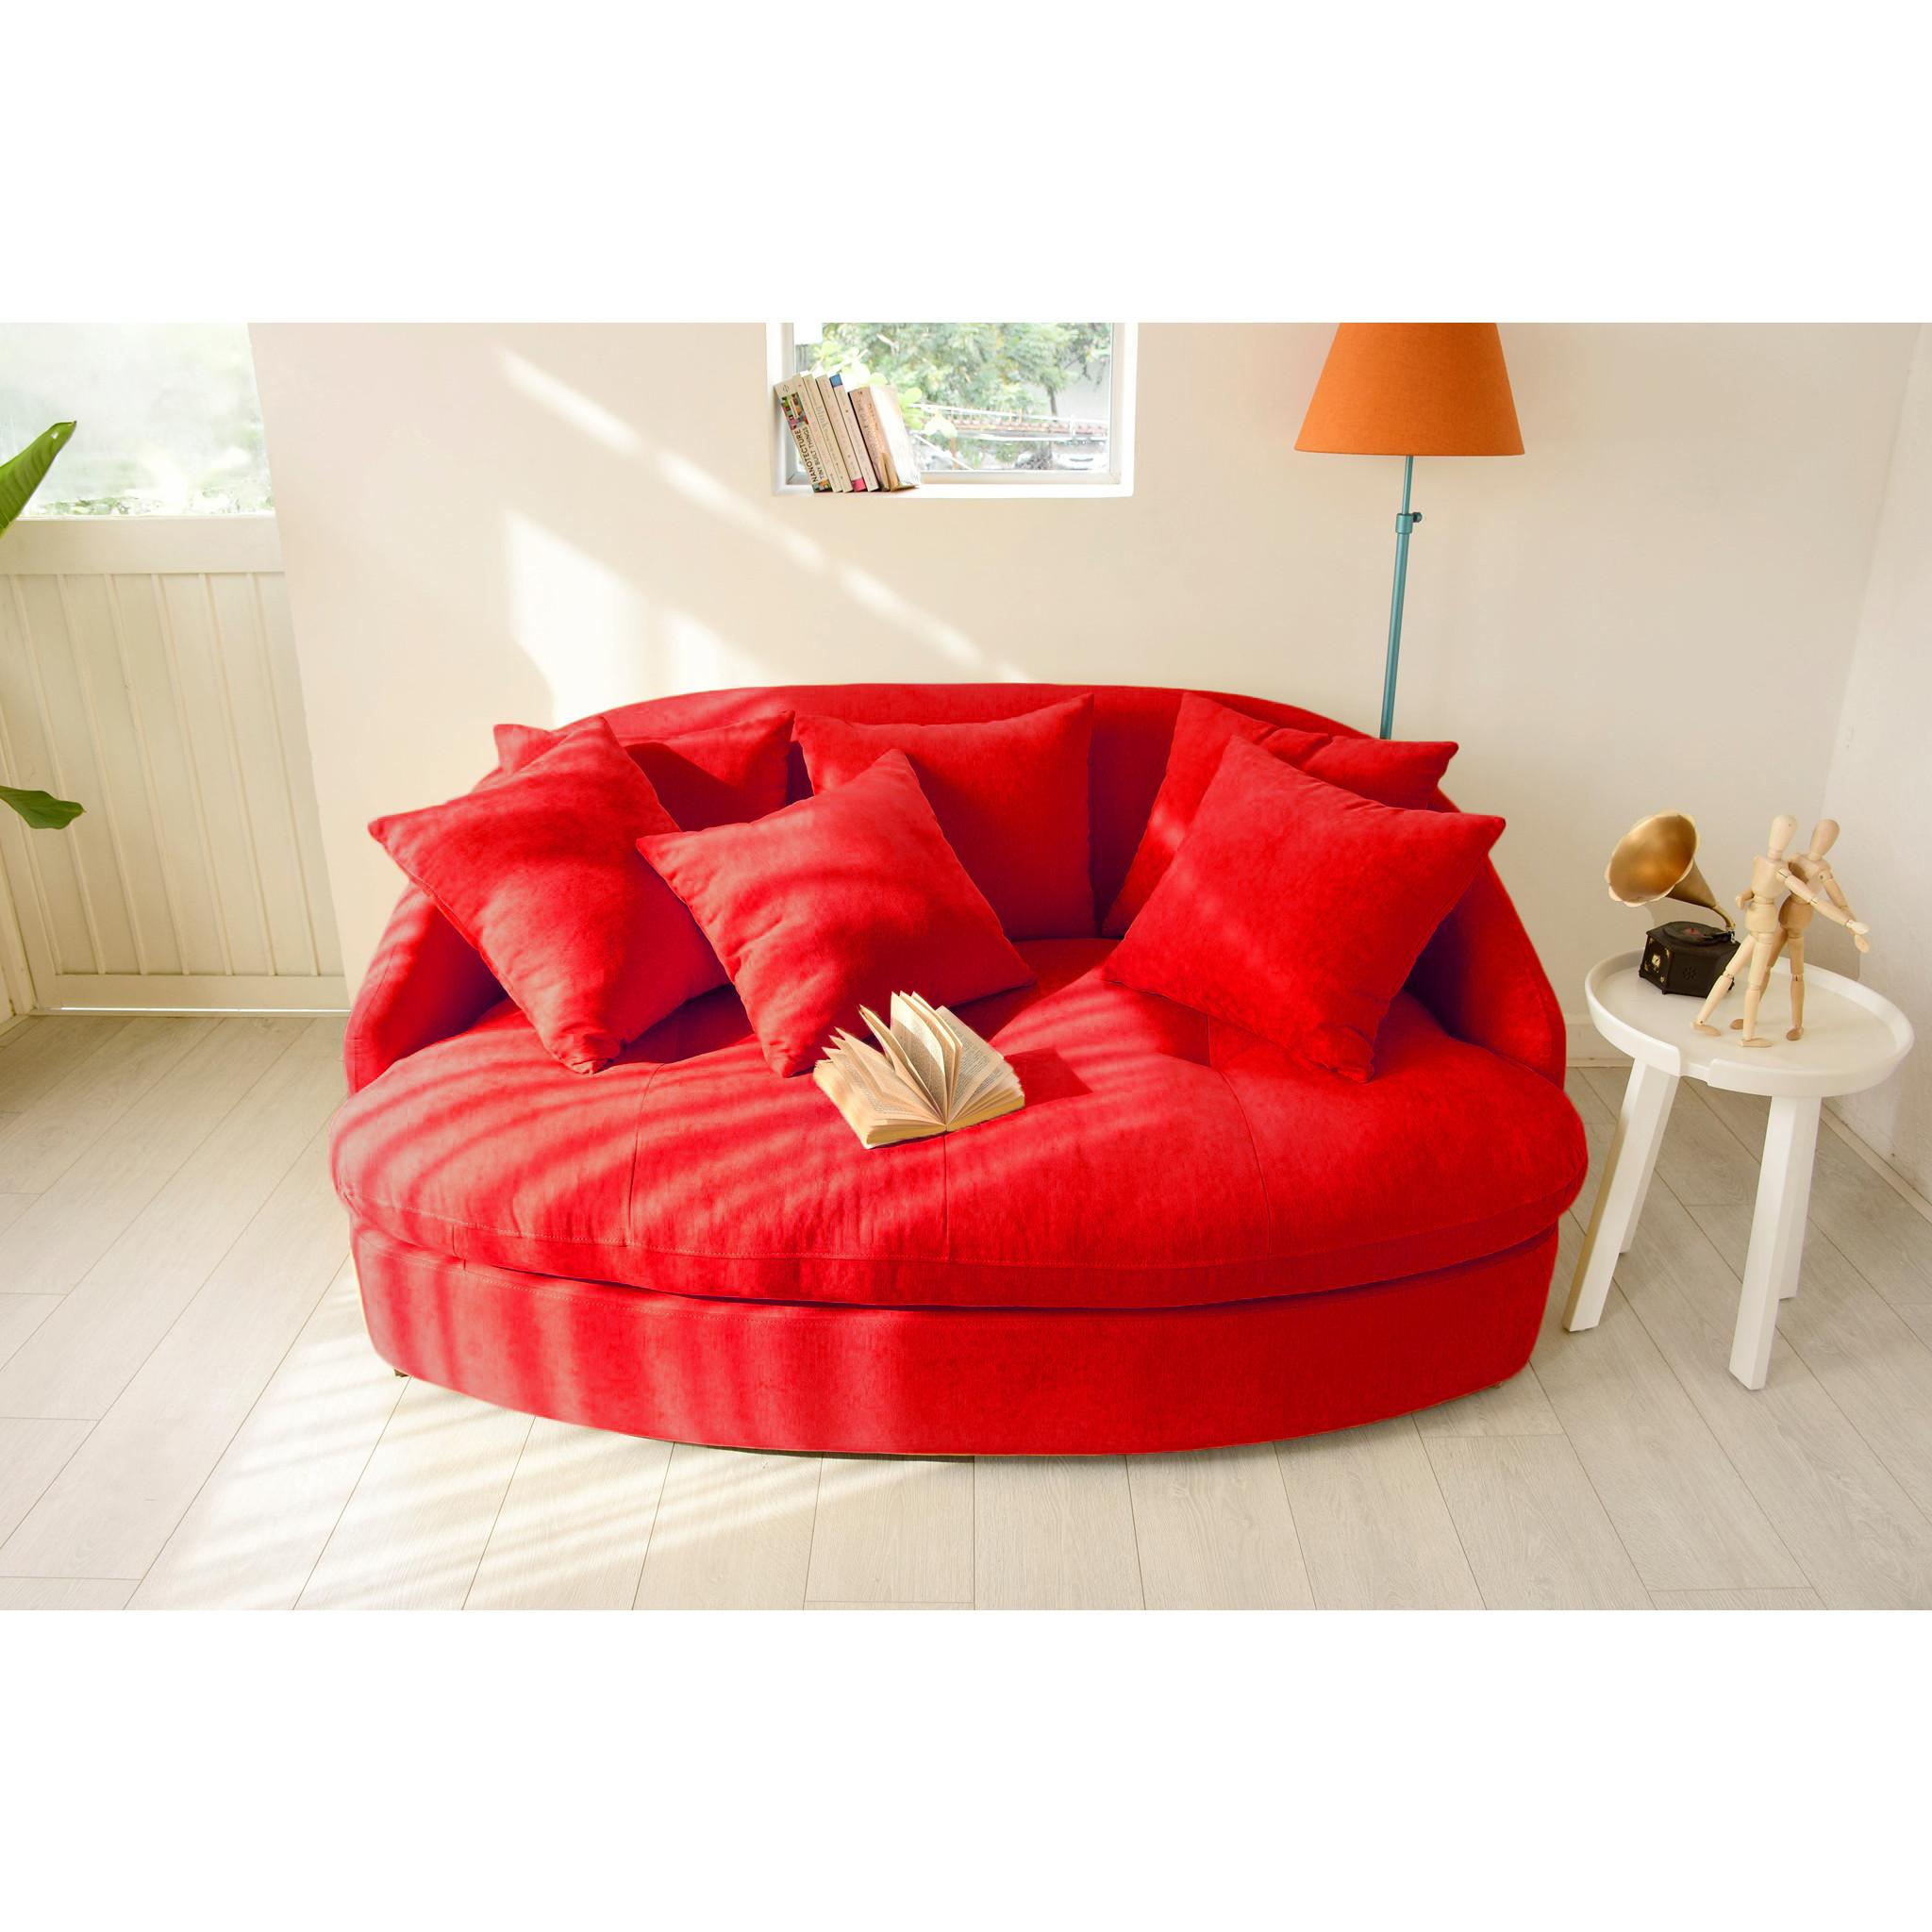 Bộ sofa đơn tròn cao cấp DP-SDT01 - 16574909 , 7128829304154 , 62_26501682 , 9560000 , Bo-sofa-don-tron-cao-cap-DP-SDT01-62_26501682 , tiki.vn , Bộ sofa đơn tròn cao cấp DP-SDT01